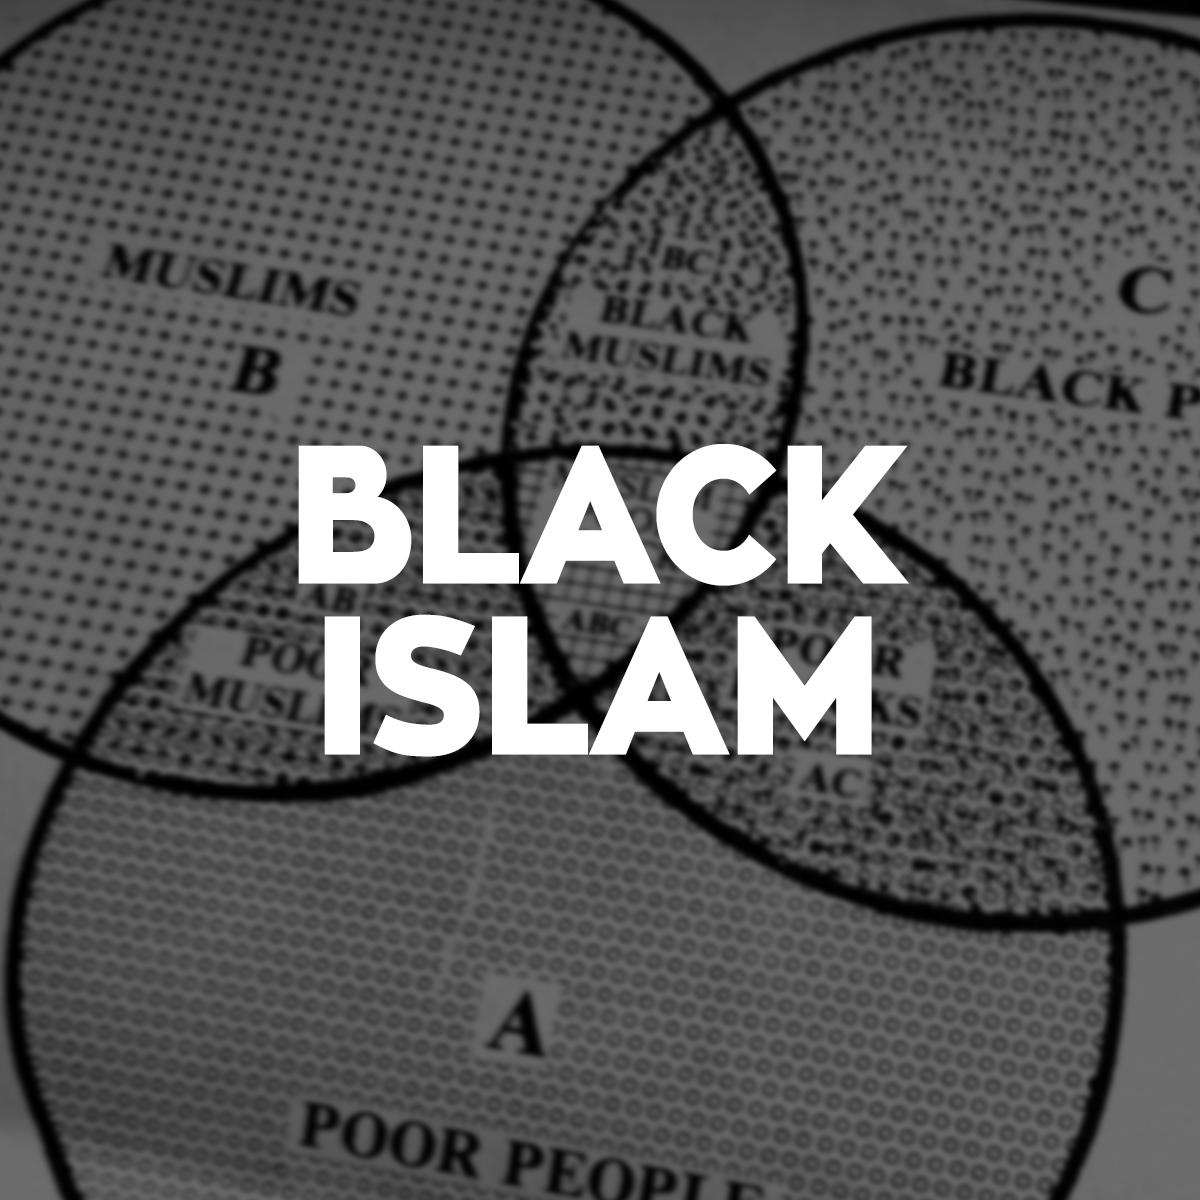 blackislam.jpg